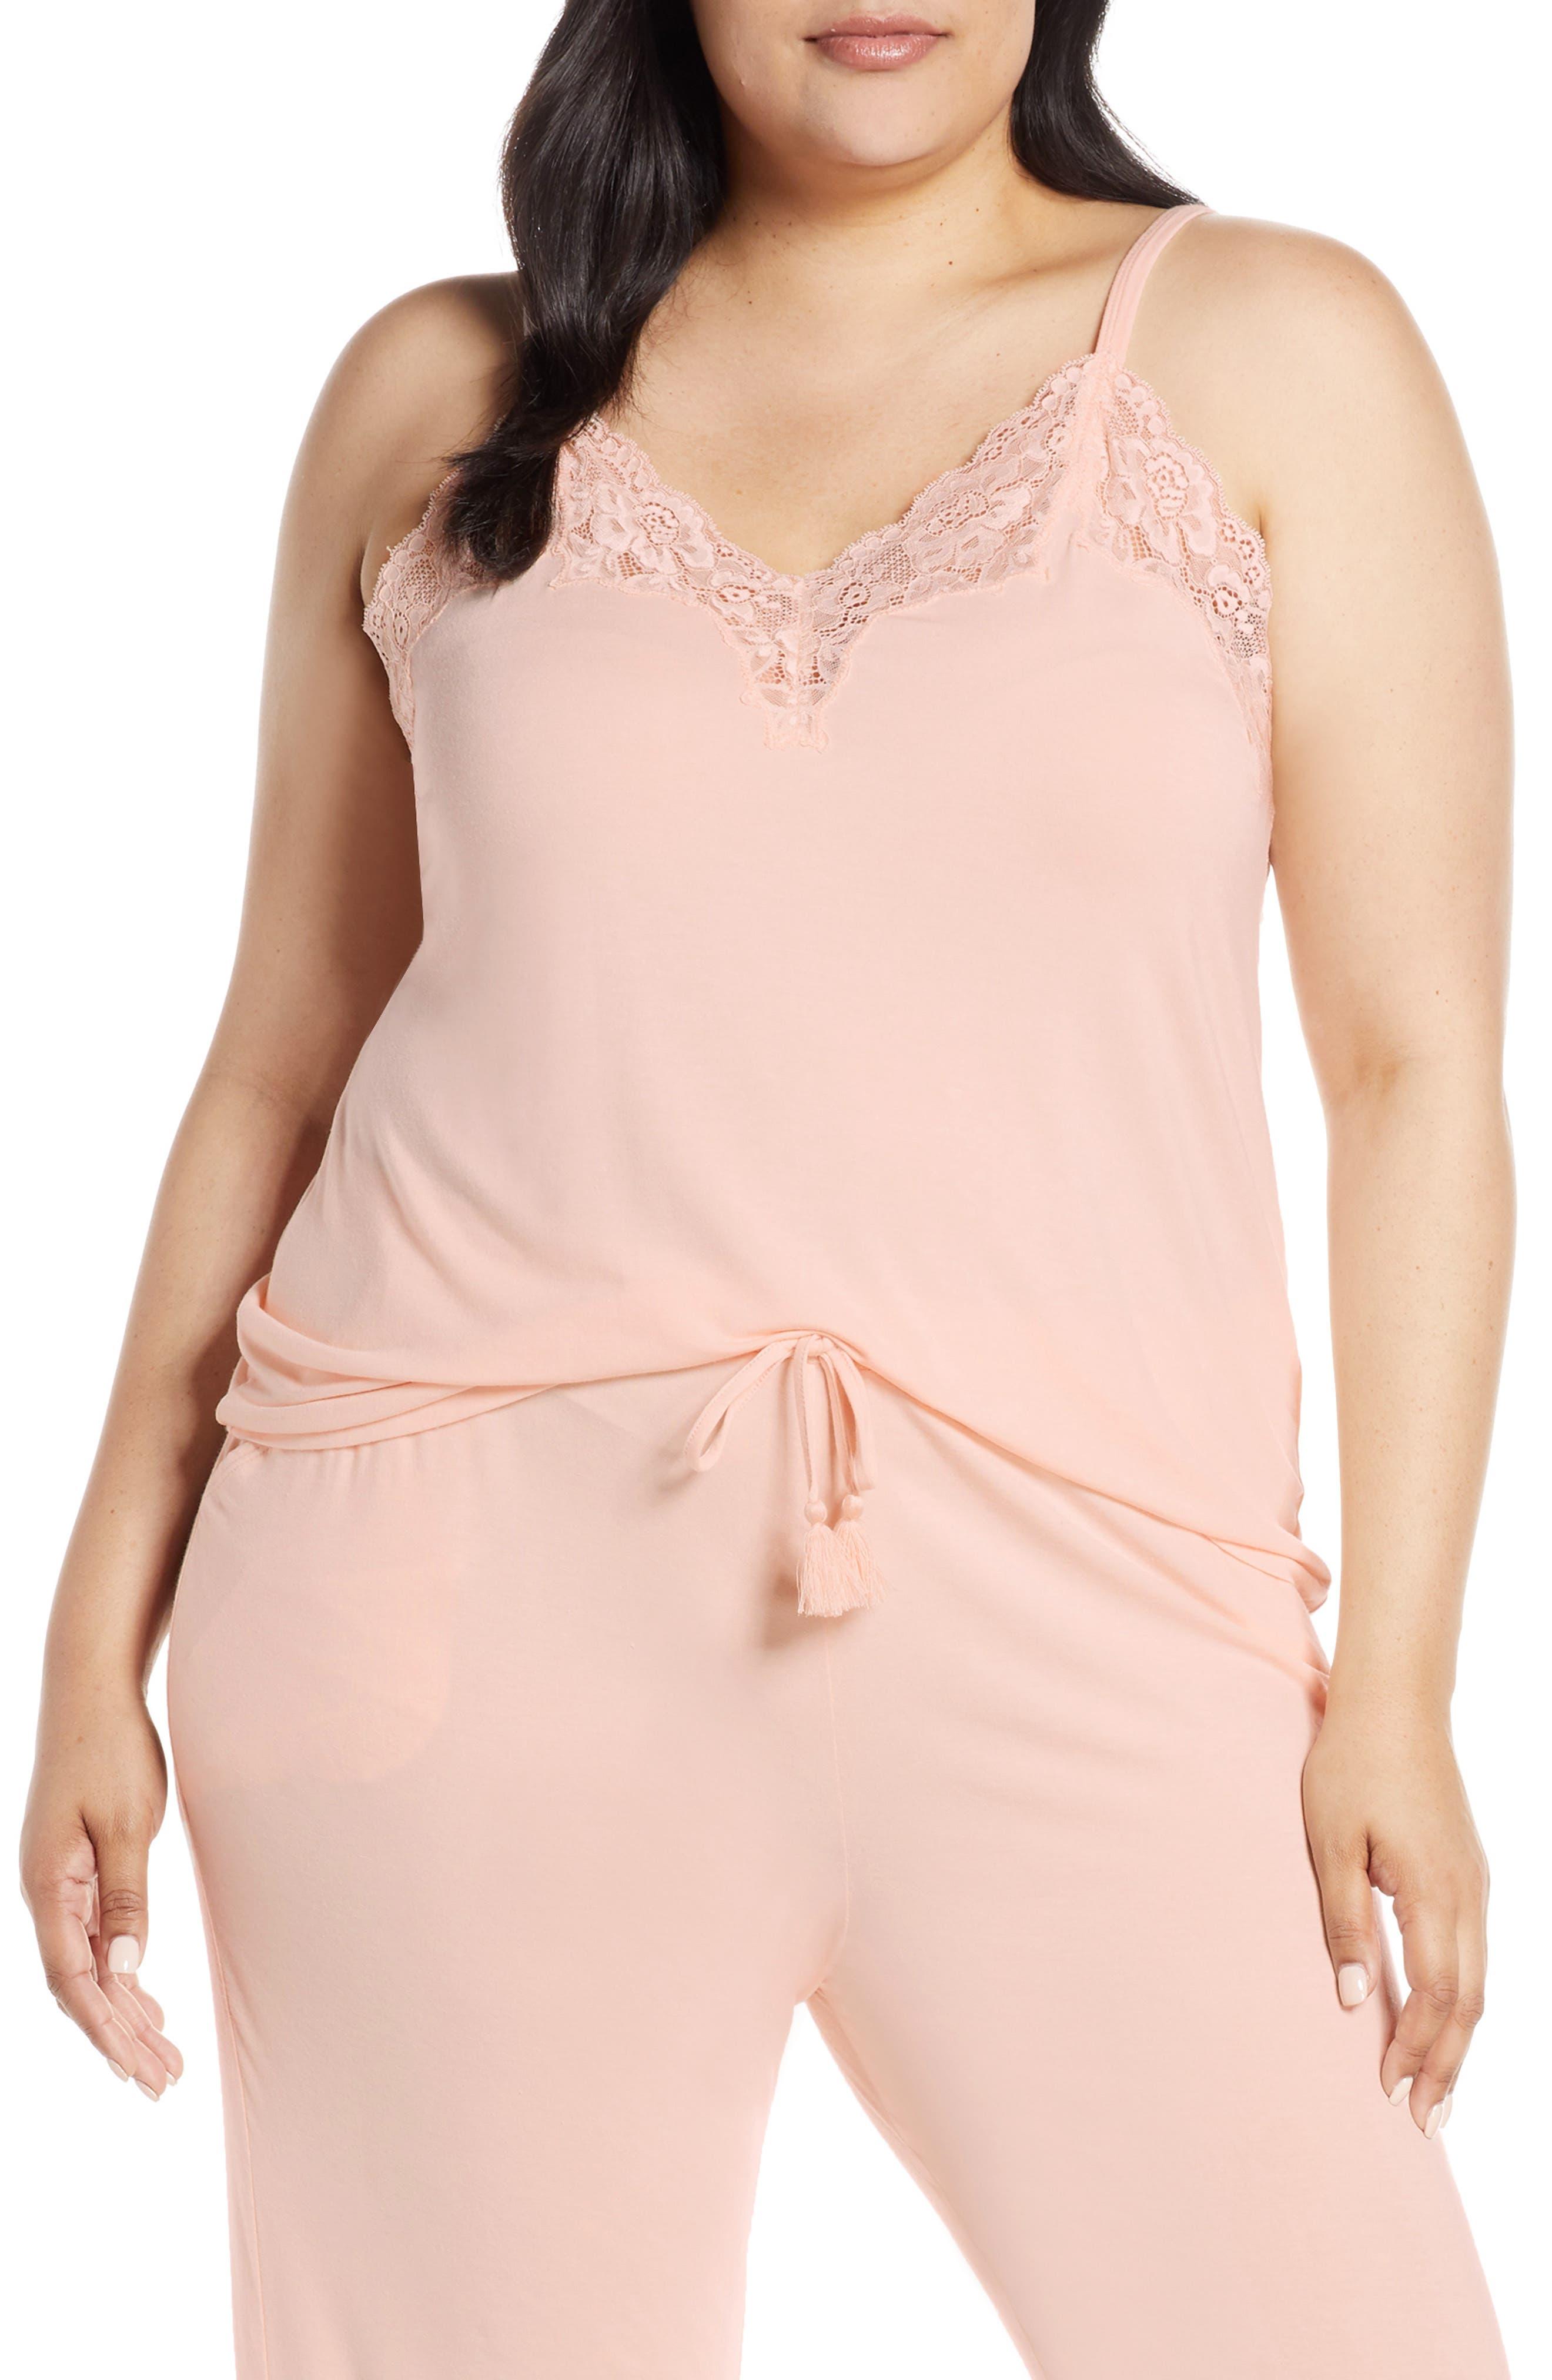 Plus Size Nordstrom Lingerie Moonlight Pajama Tank, Pink